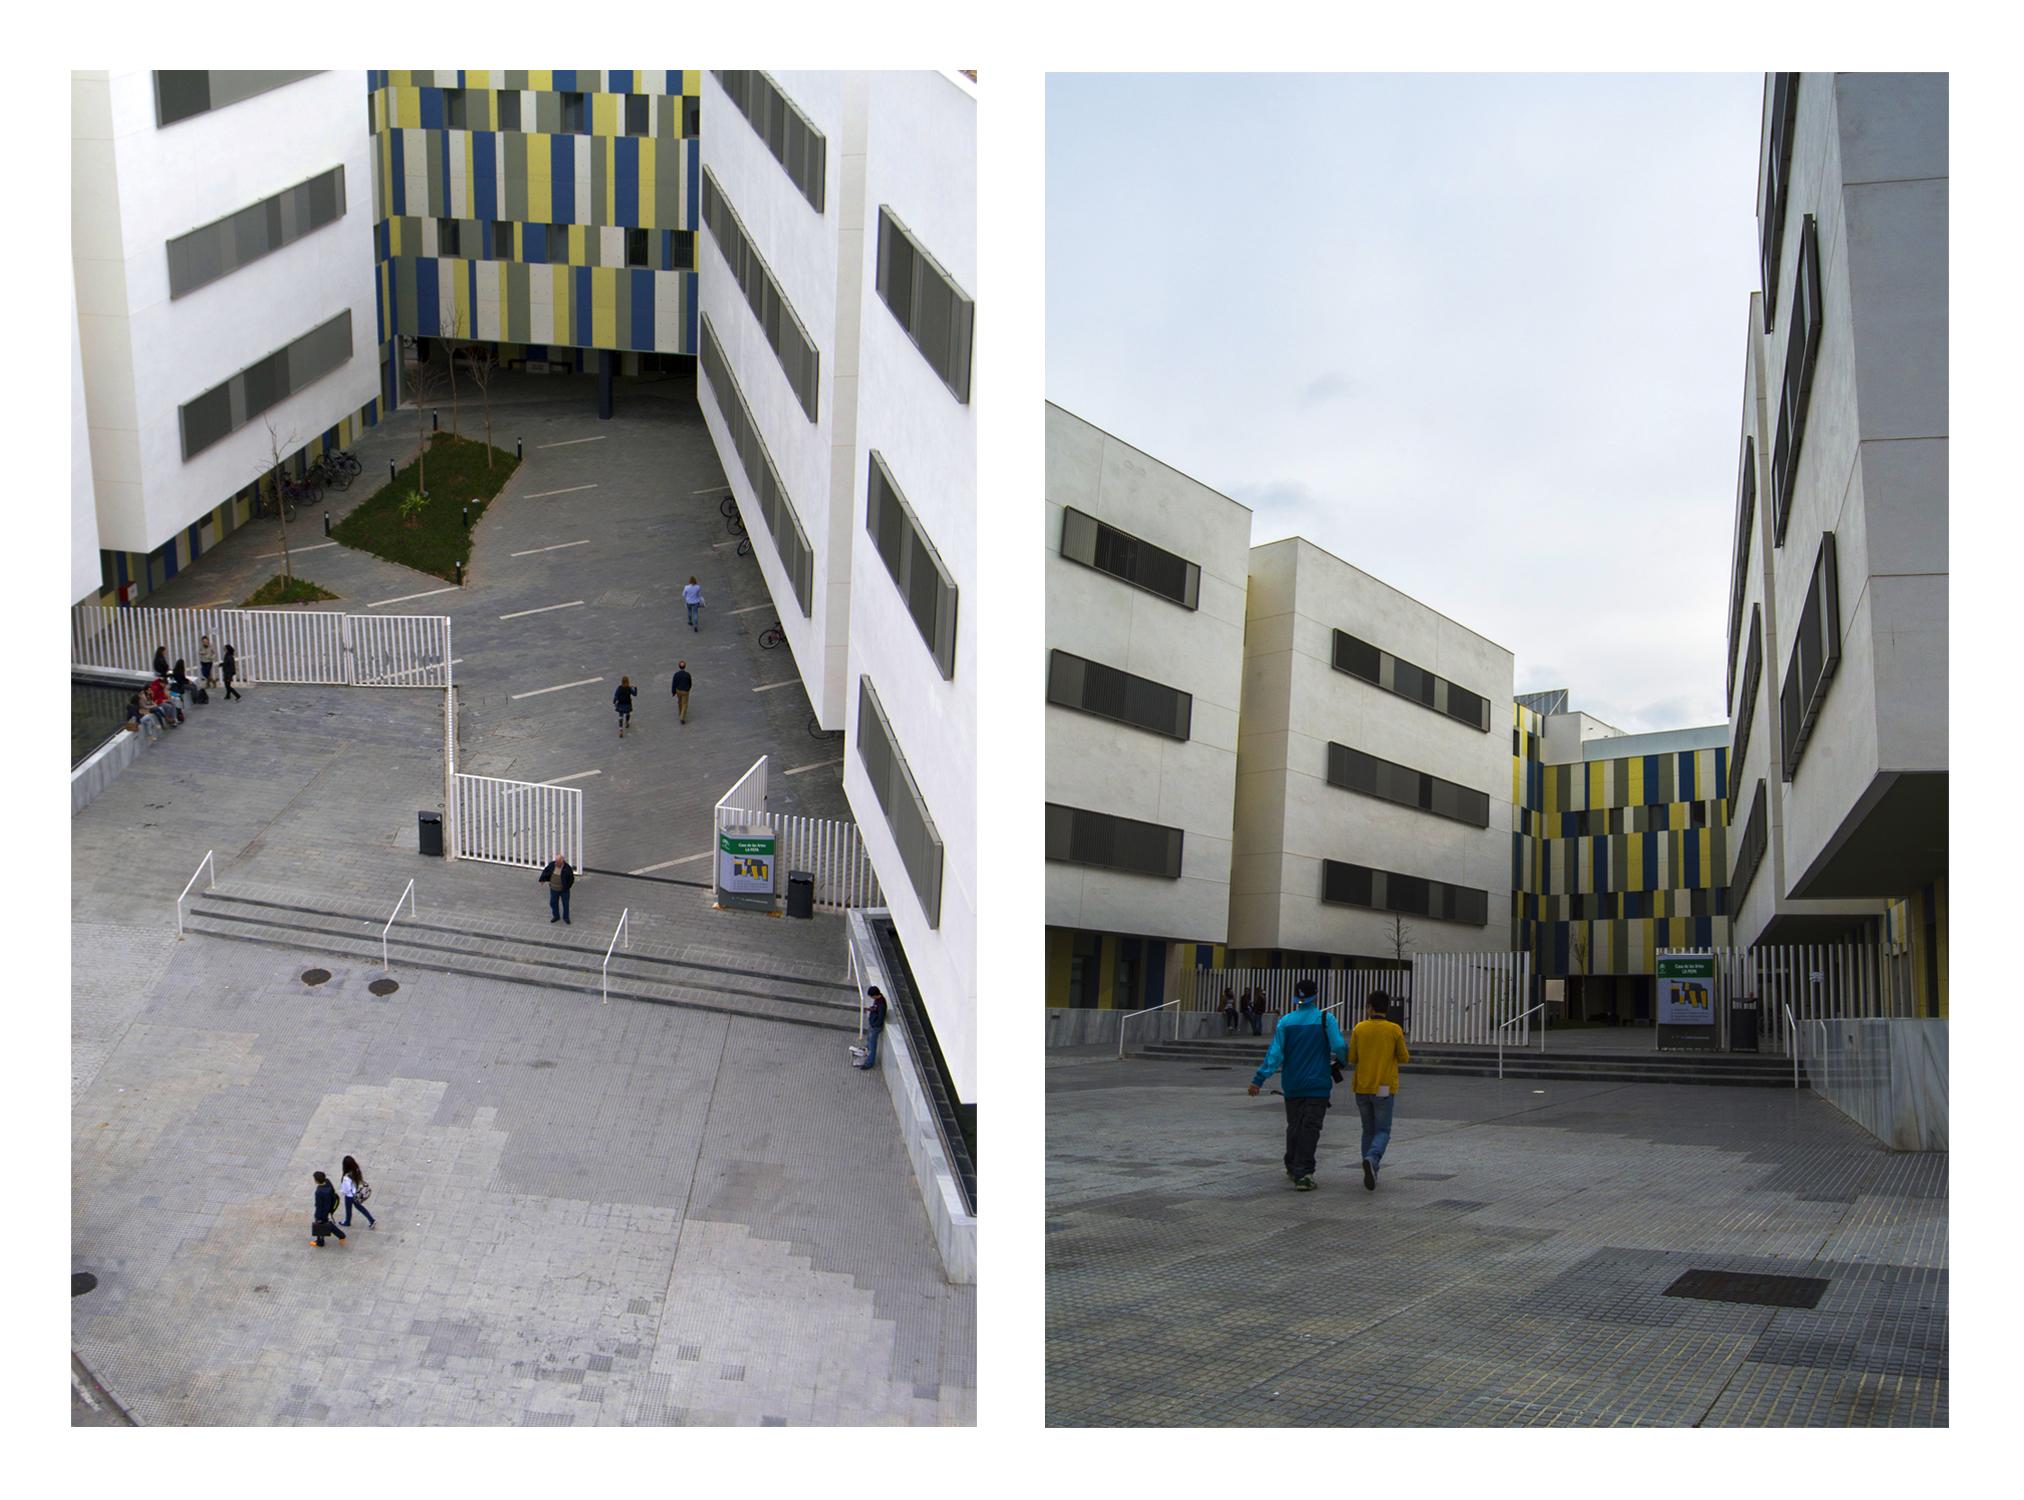 entrada-escuela-imagen-doble